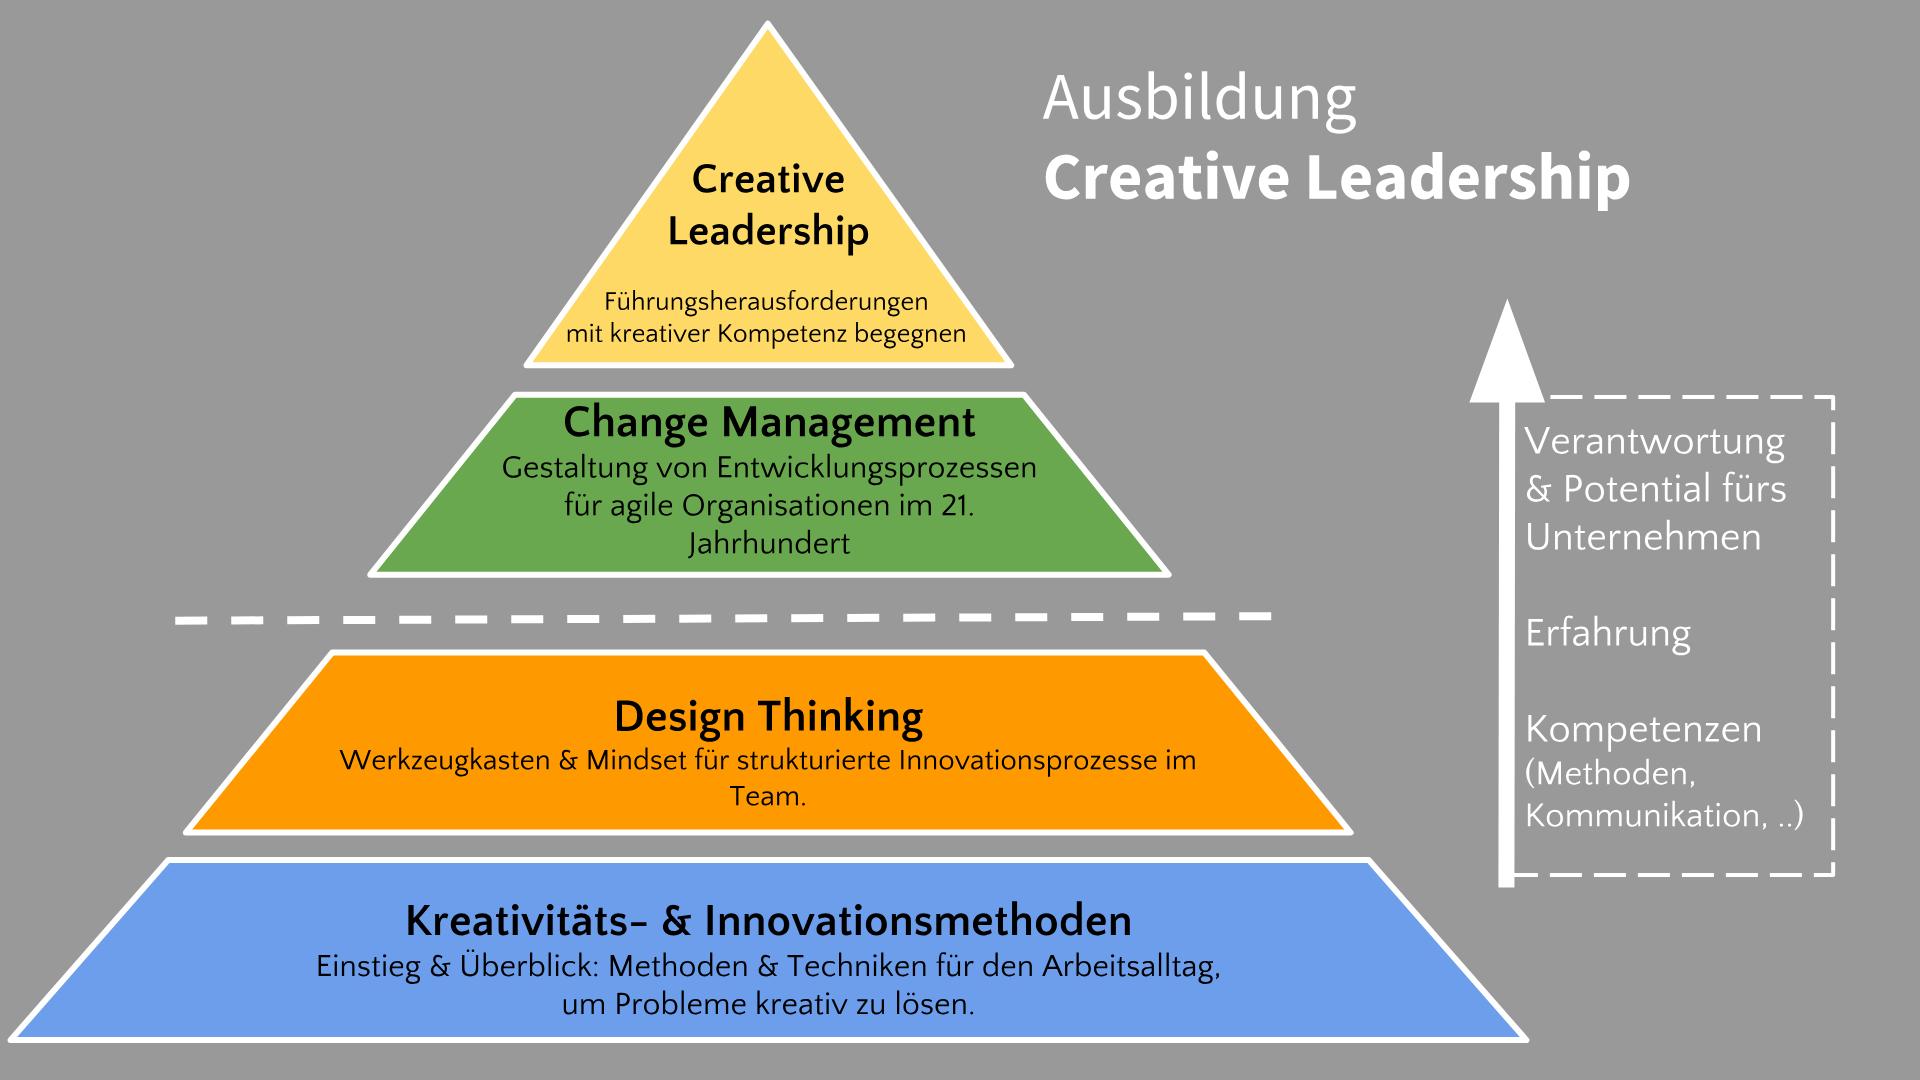 Creative Leadership Ausbildung